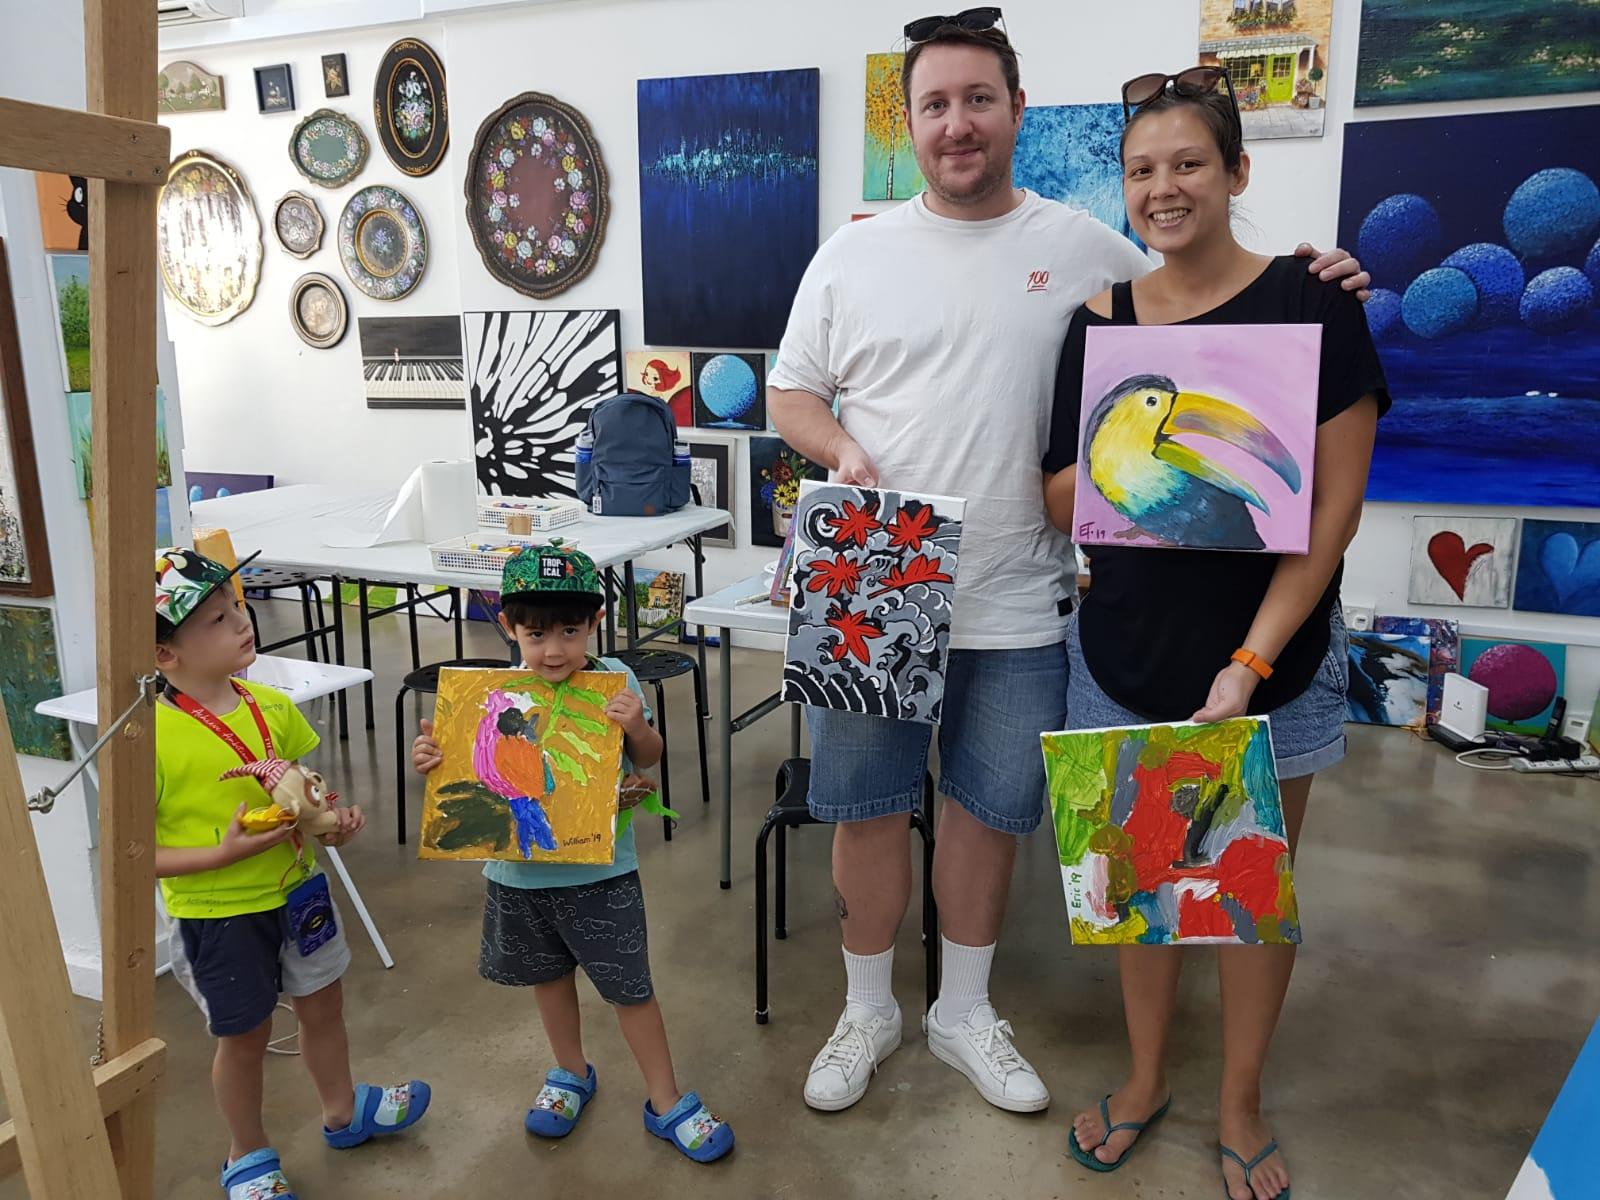 Family Art Jamming